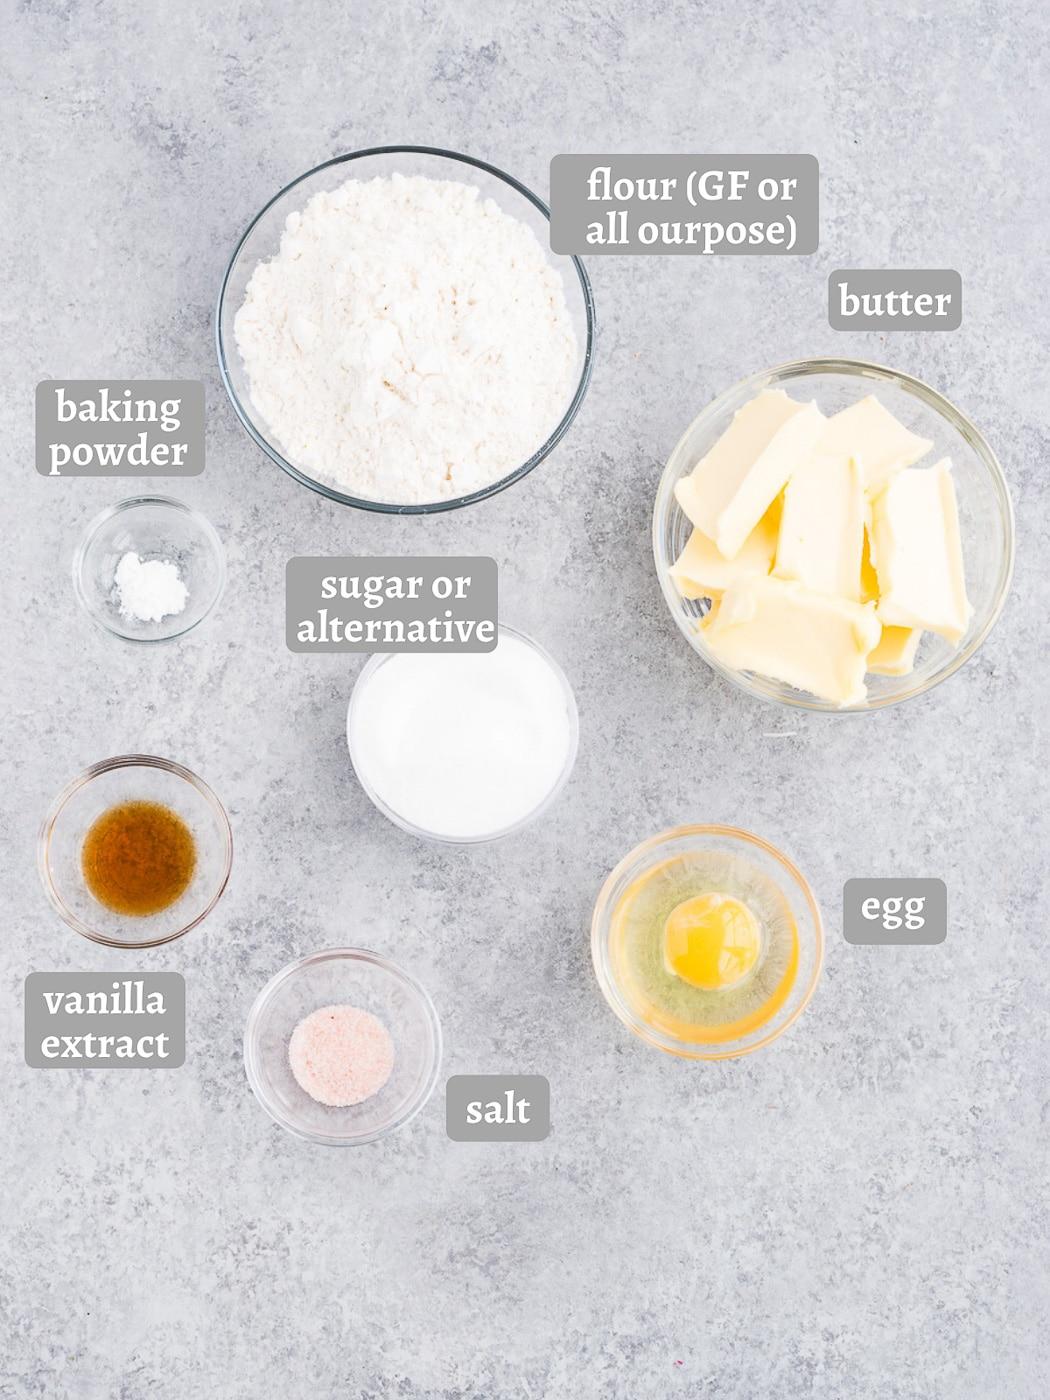 ingredients for shortbread crust